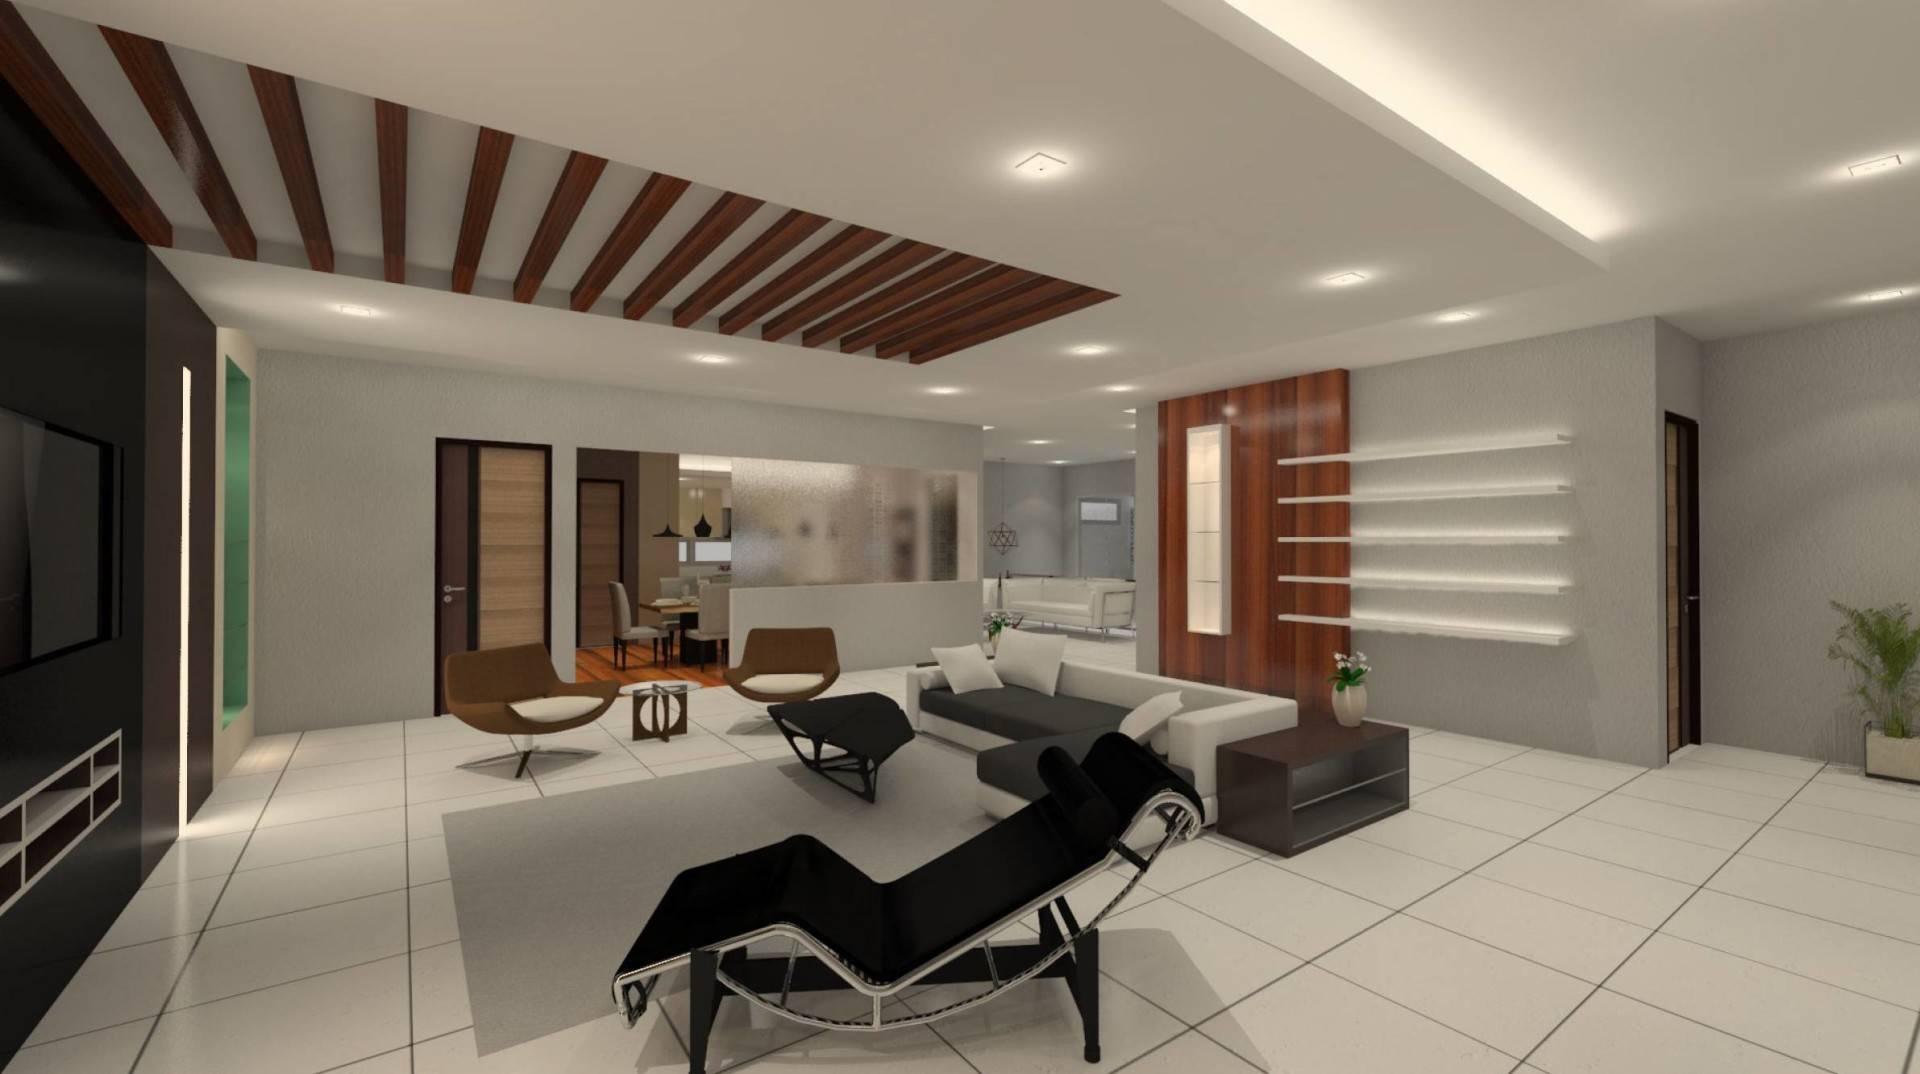 Chai Twin Co Residence At Sui Raya Dalam Pontianak, West Kalimantan Pontianak, West Kalimantan Living Room   2374